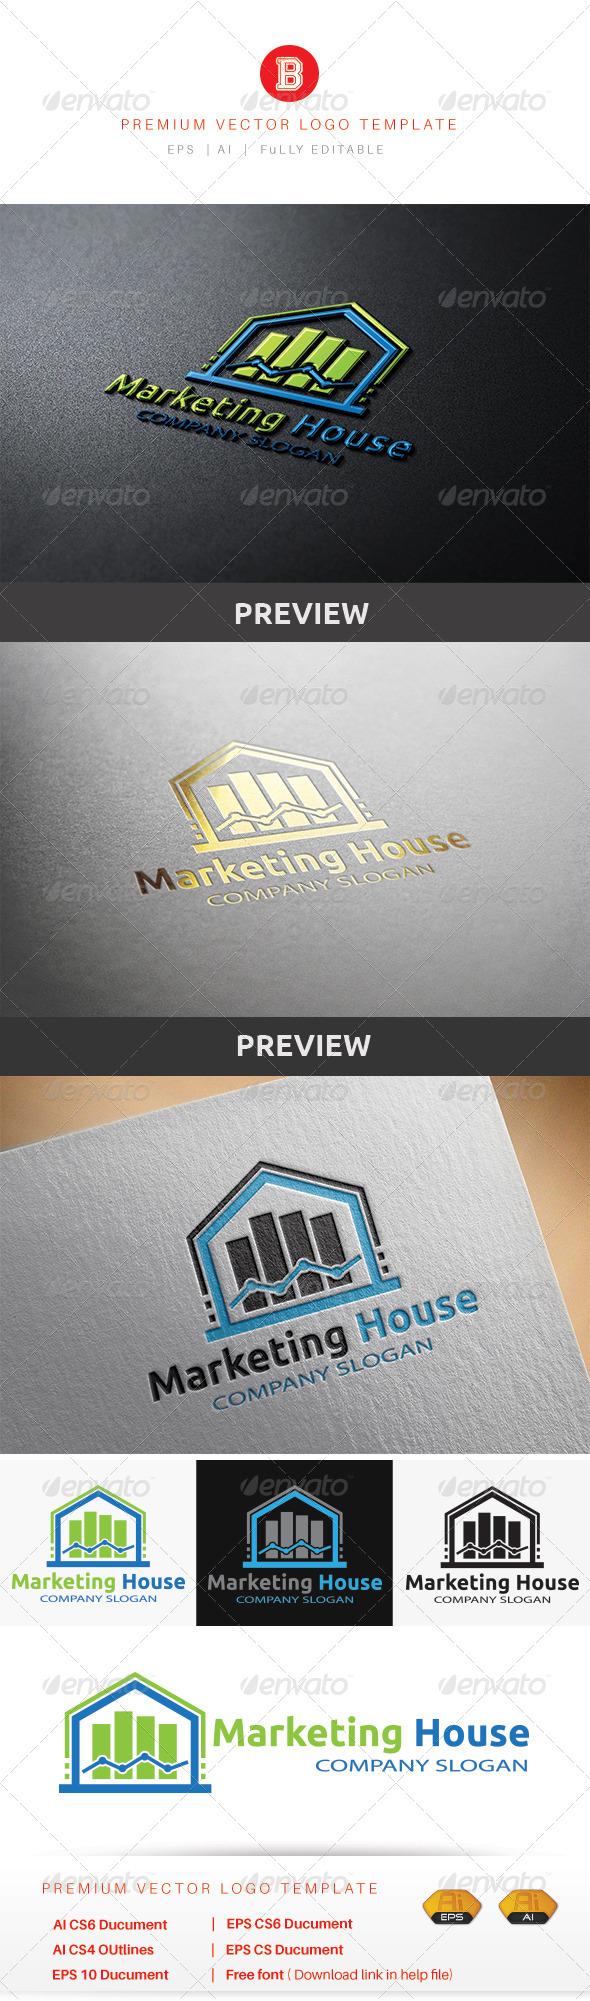 GraphicRiver Marketing House 8537620